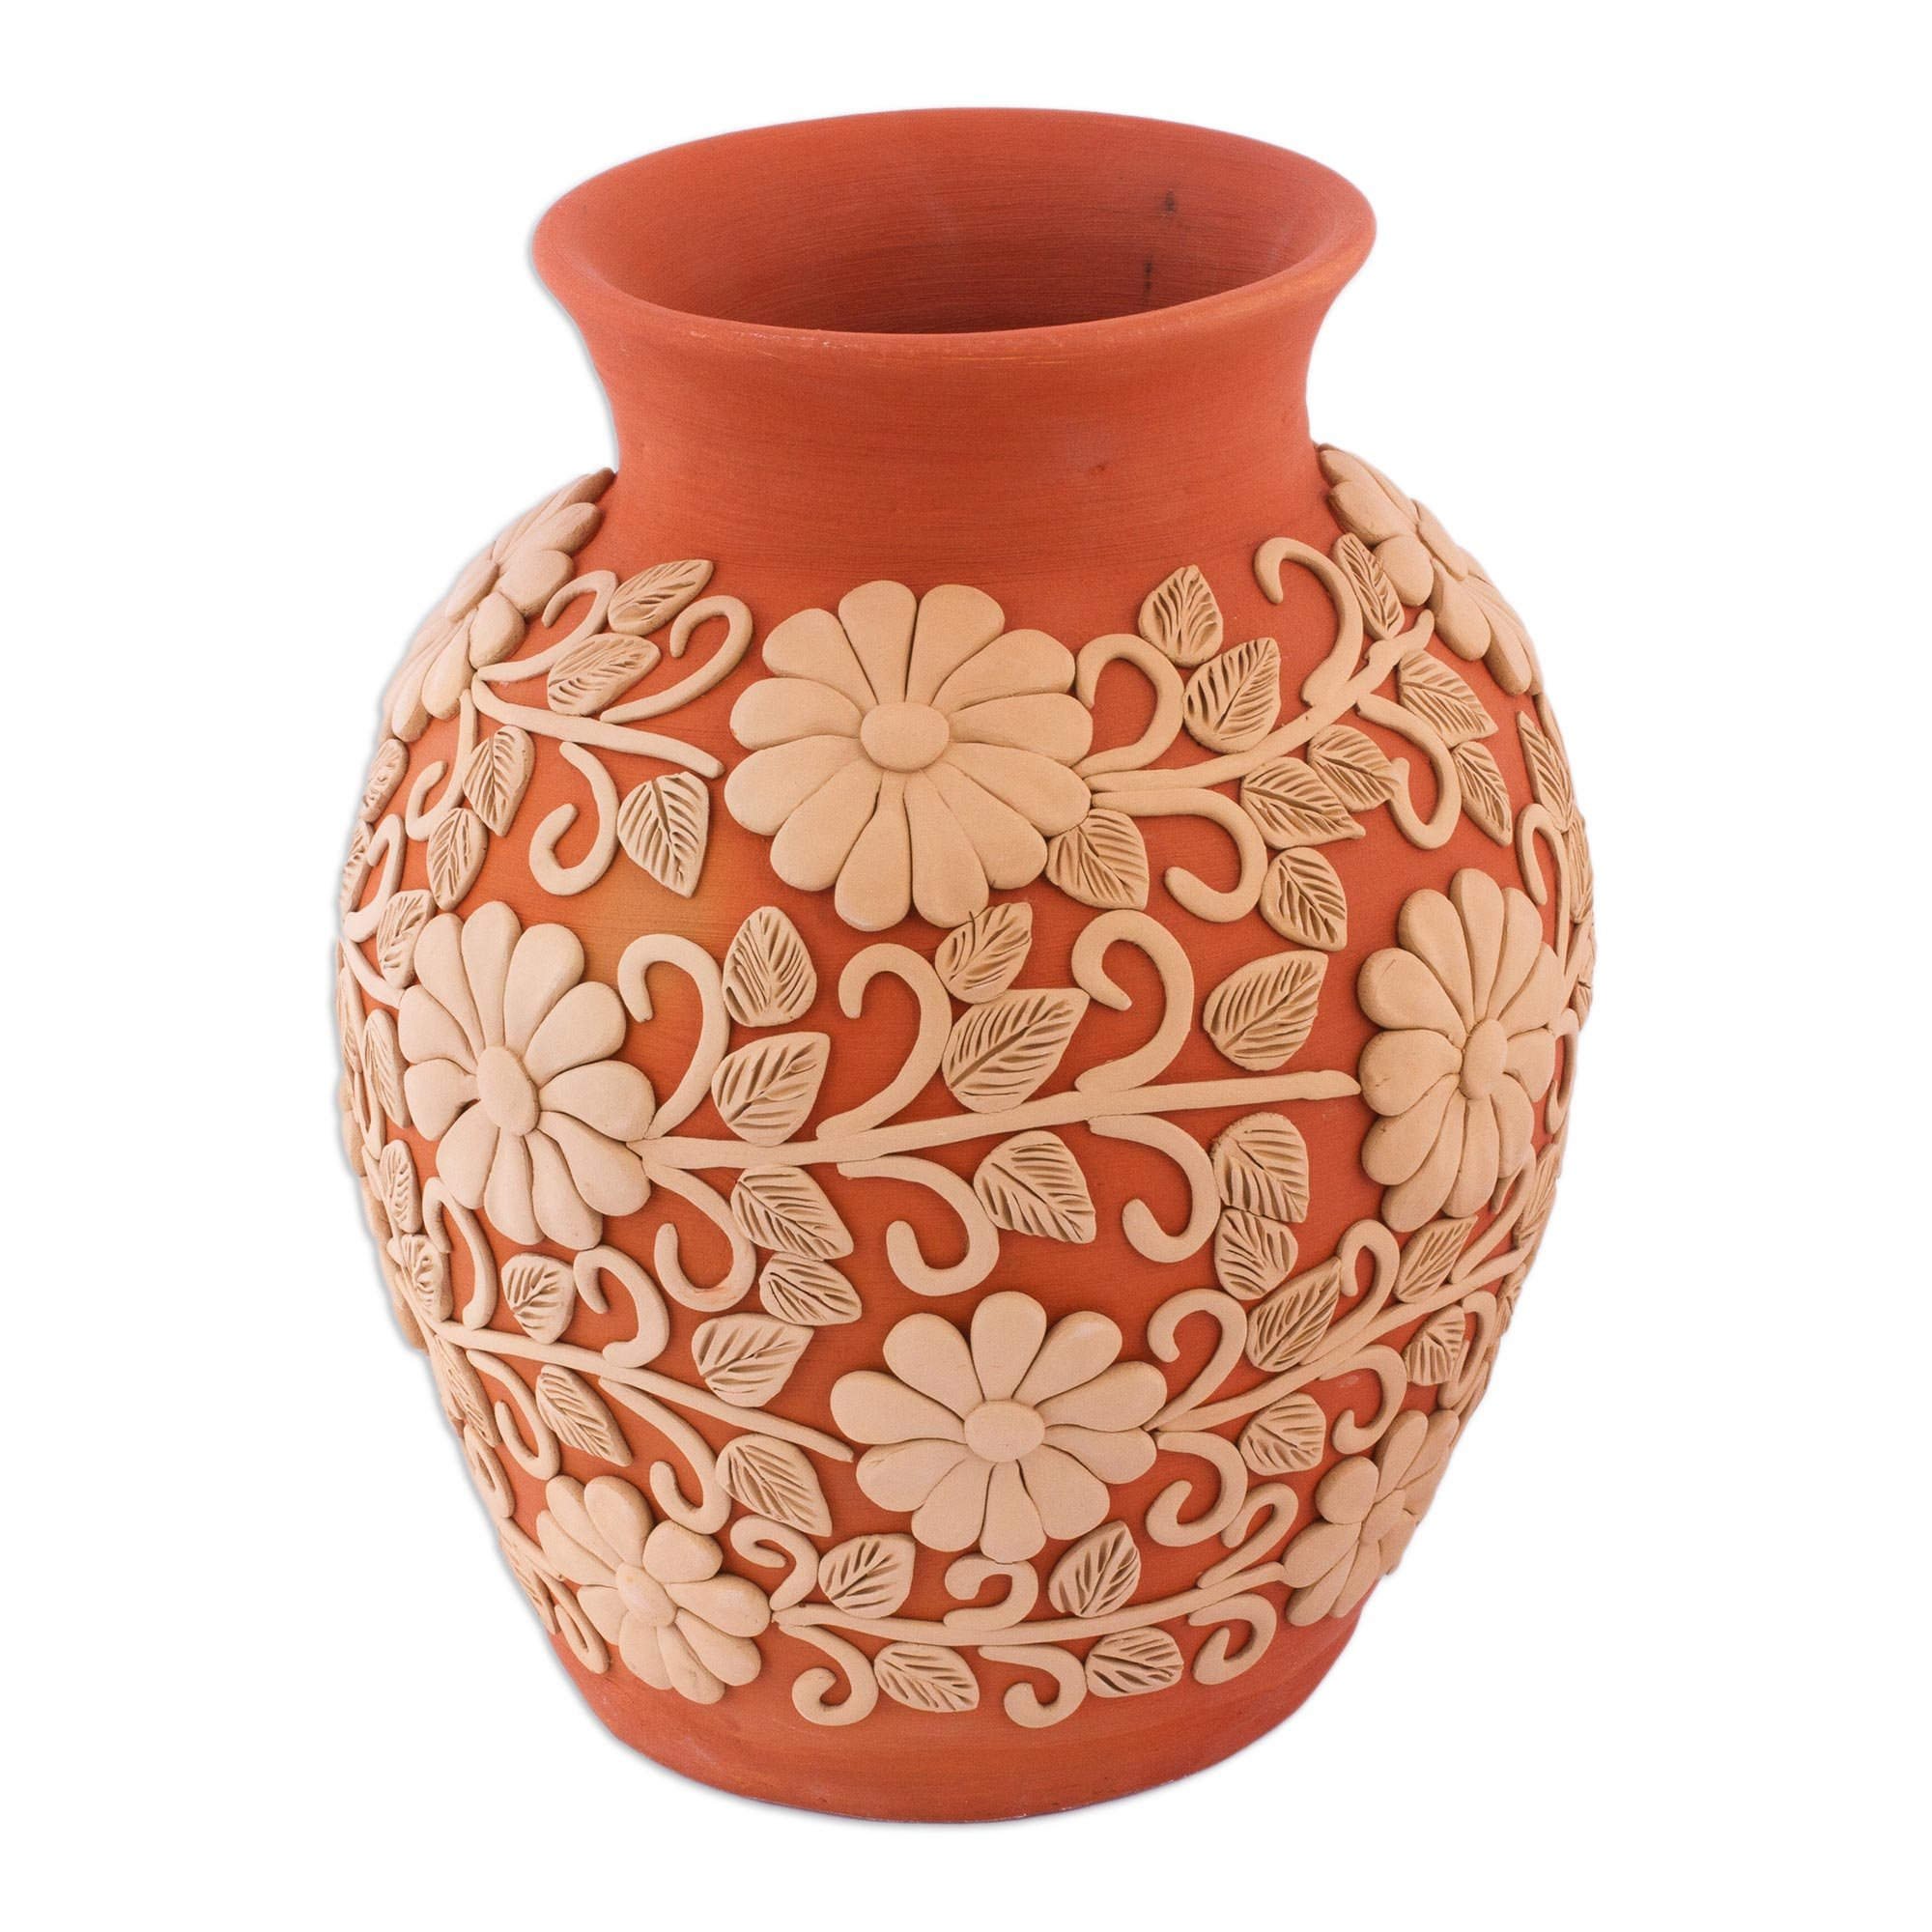 NOVICA Floral Ceramic Vase, Earthone, 'Pure Earth'